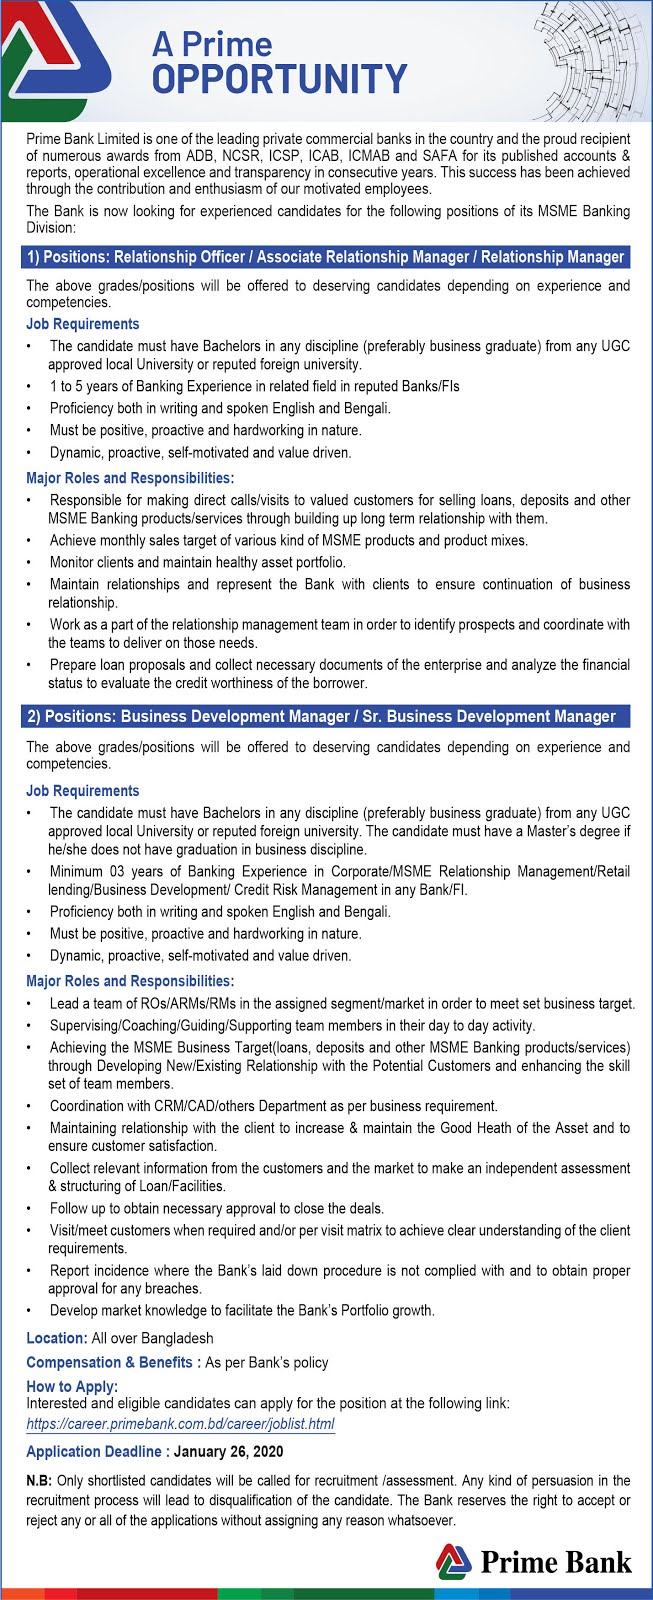 prime bank job circular 2020 - প্রাইম ব্যাংক নিয়োগ বিজ্ঞপ্তি ২০২০ - আজকের চাকরির  খবর ২০২০